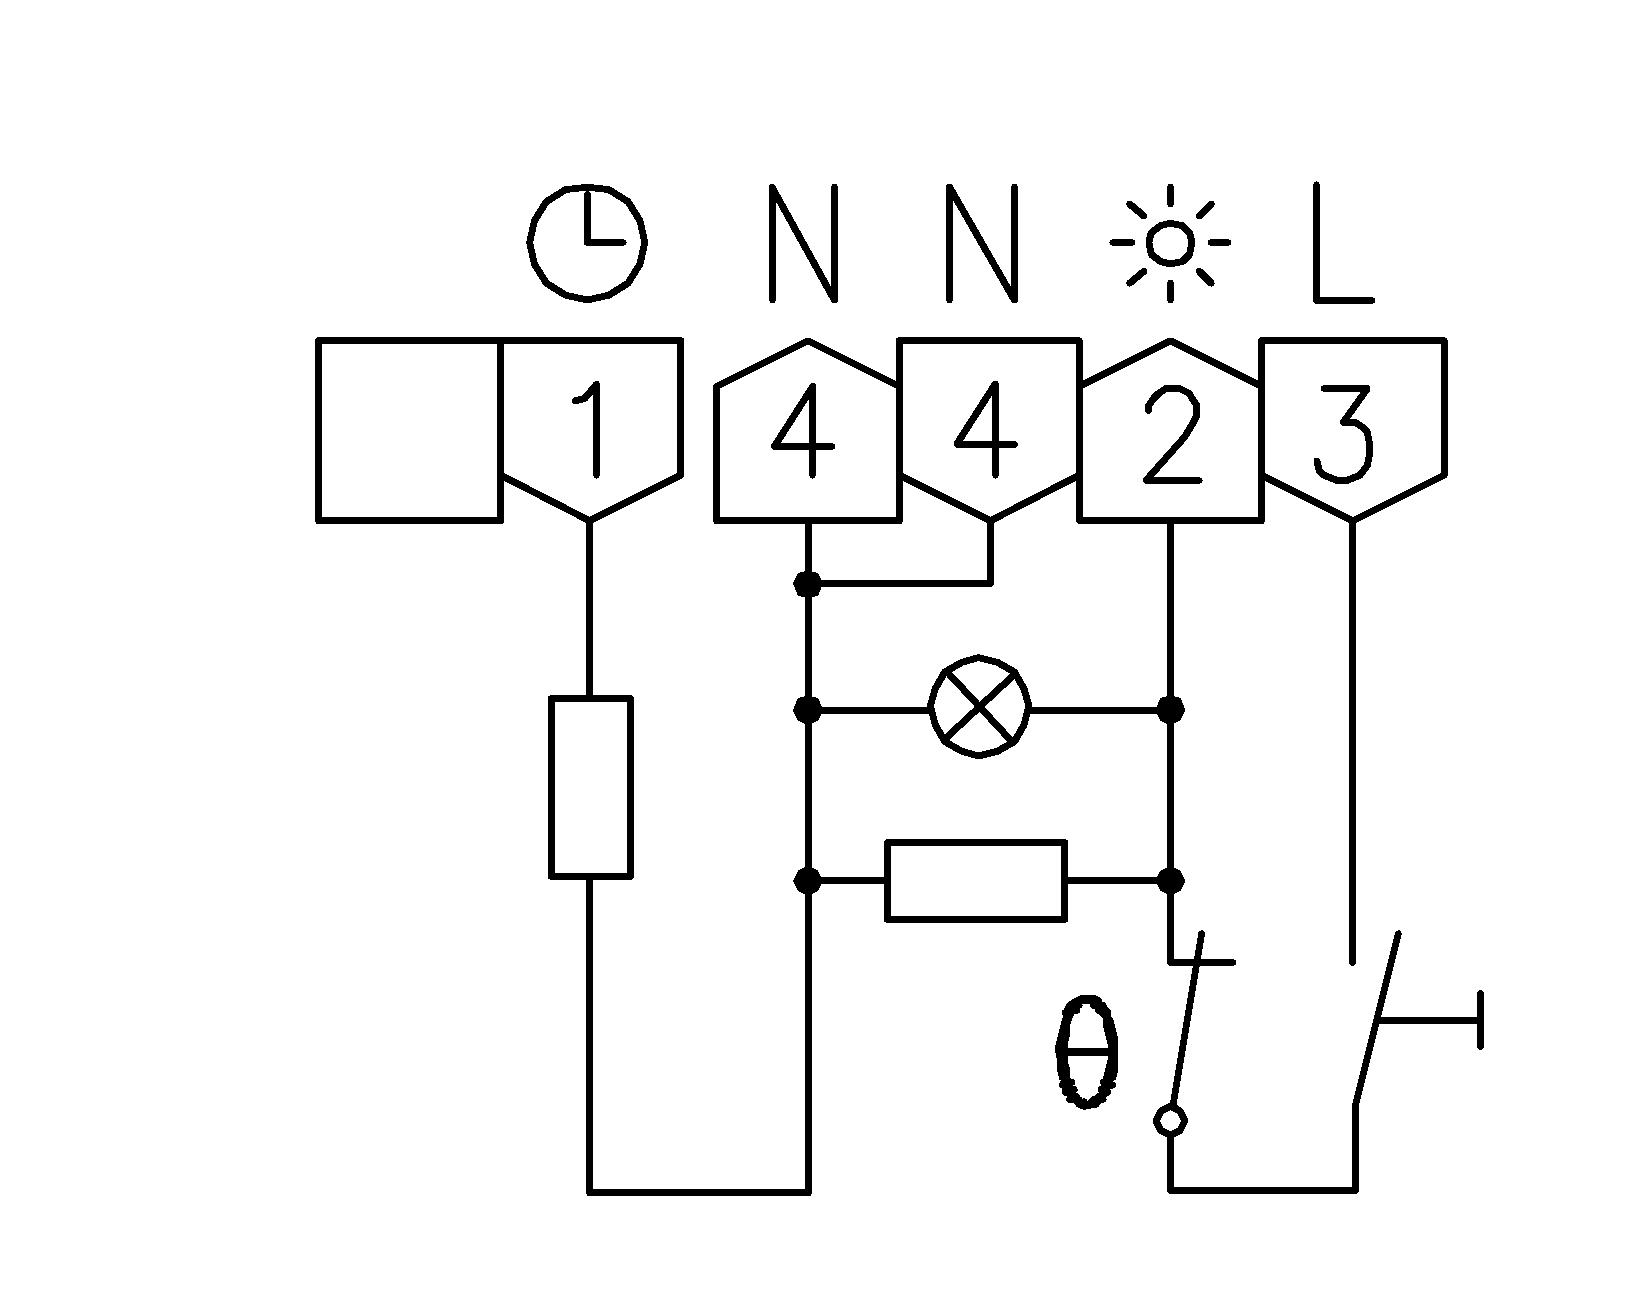 MA012400 Circuit diagram